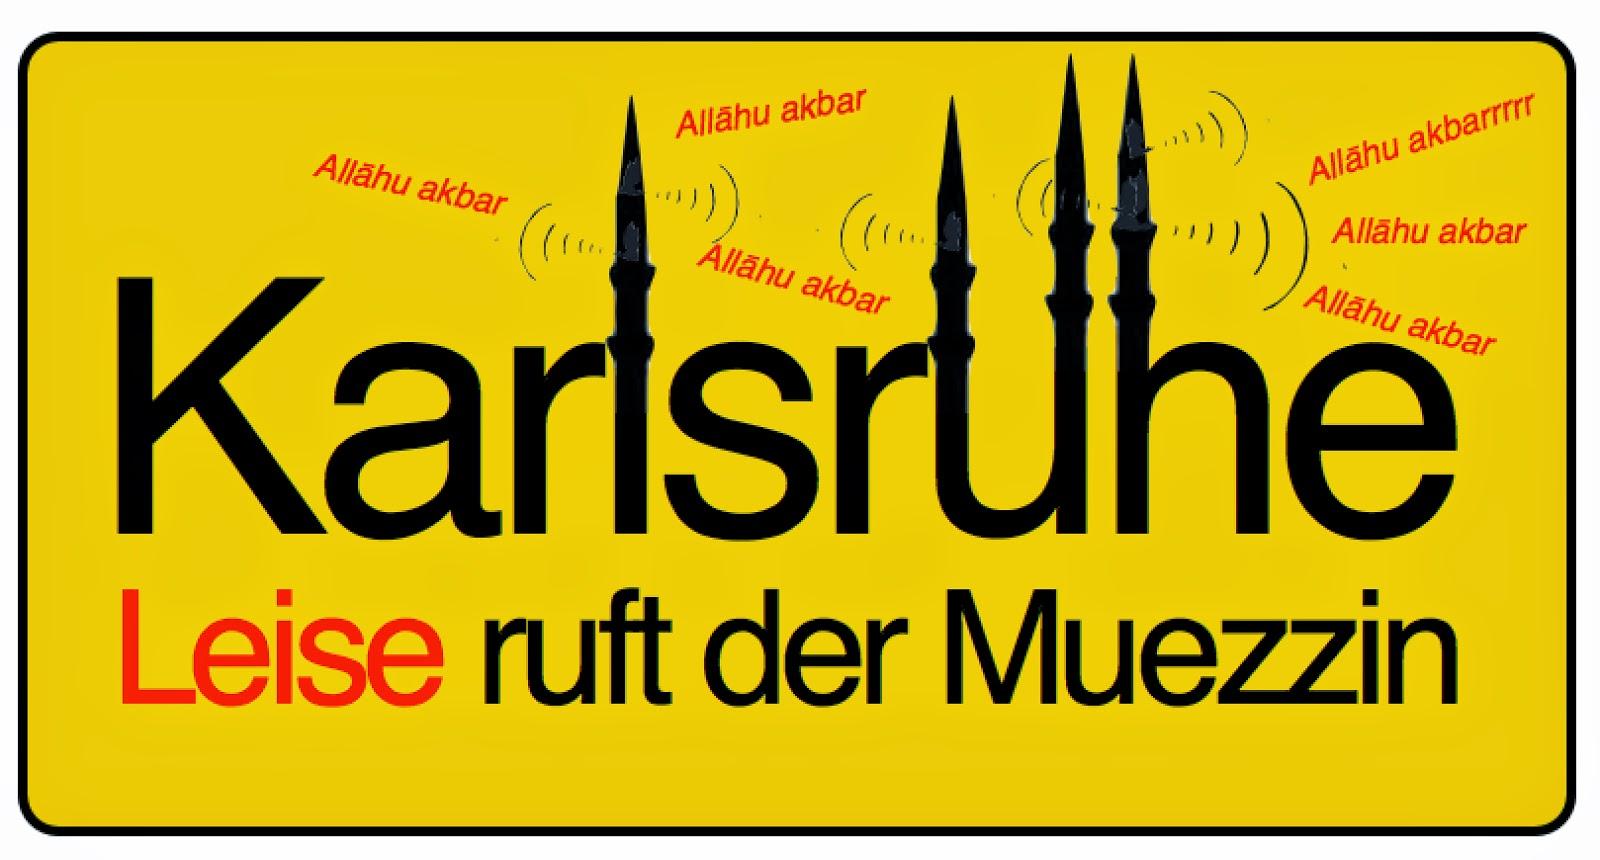 muslimisch beten lernen